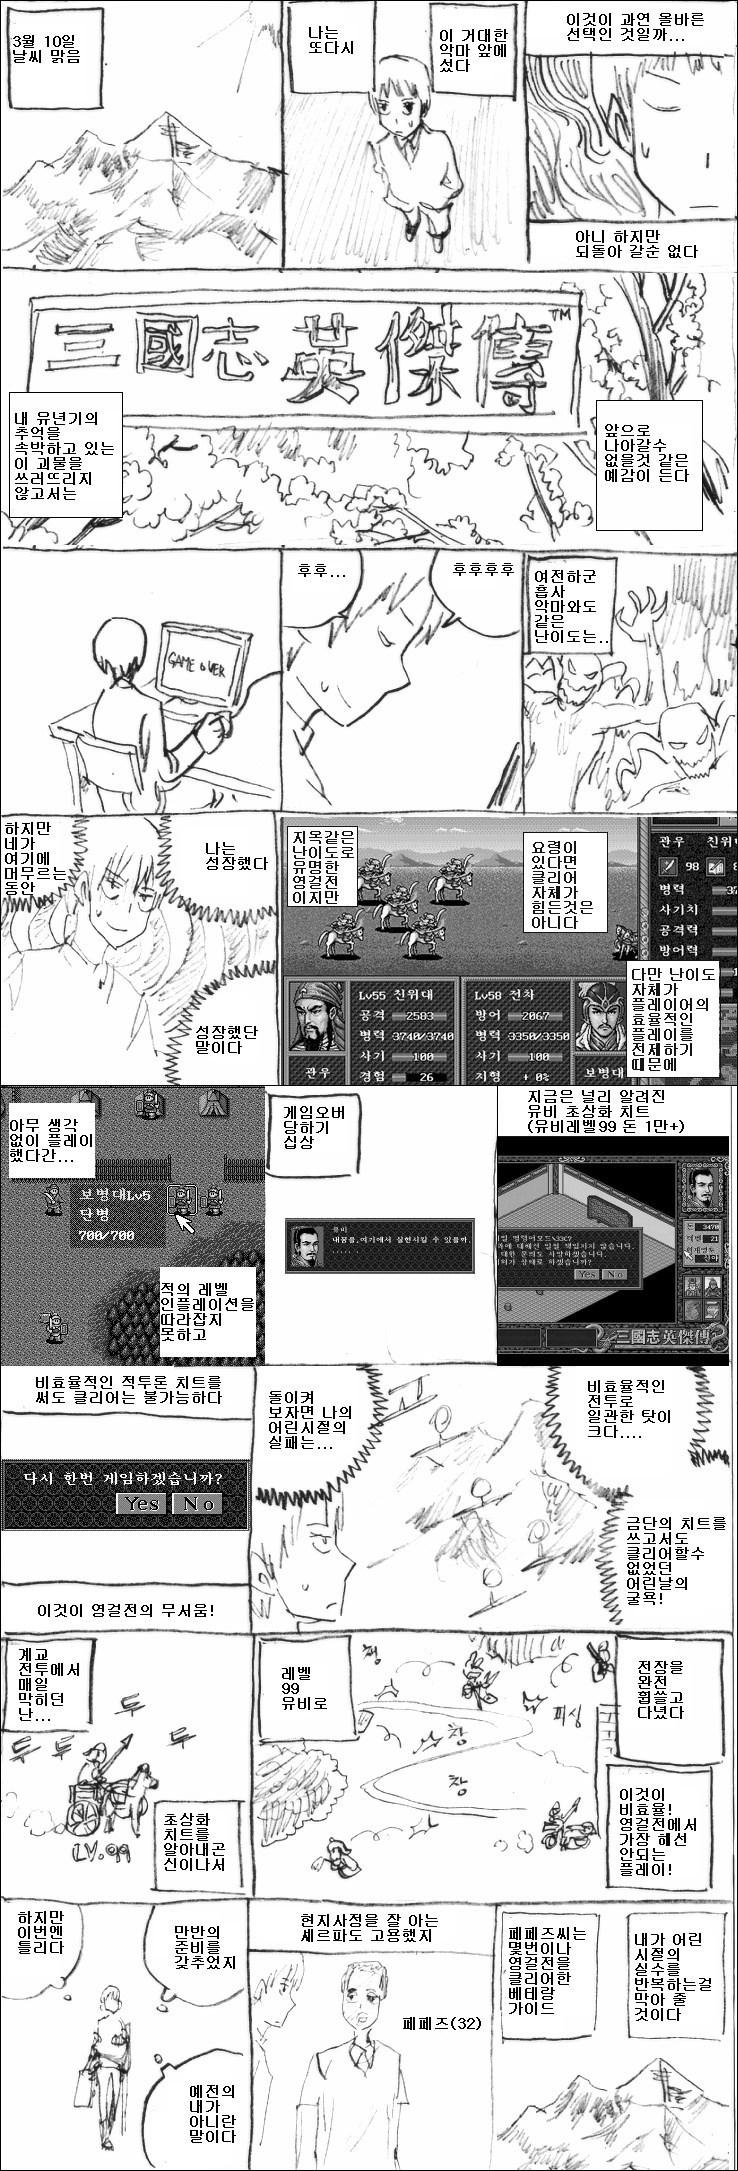 1zxz233-vert_masaruchi.jpg